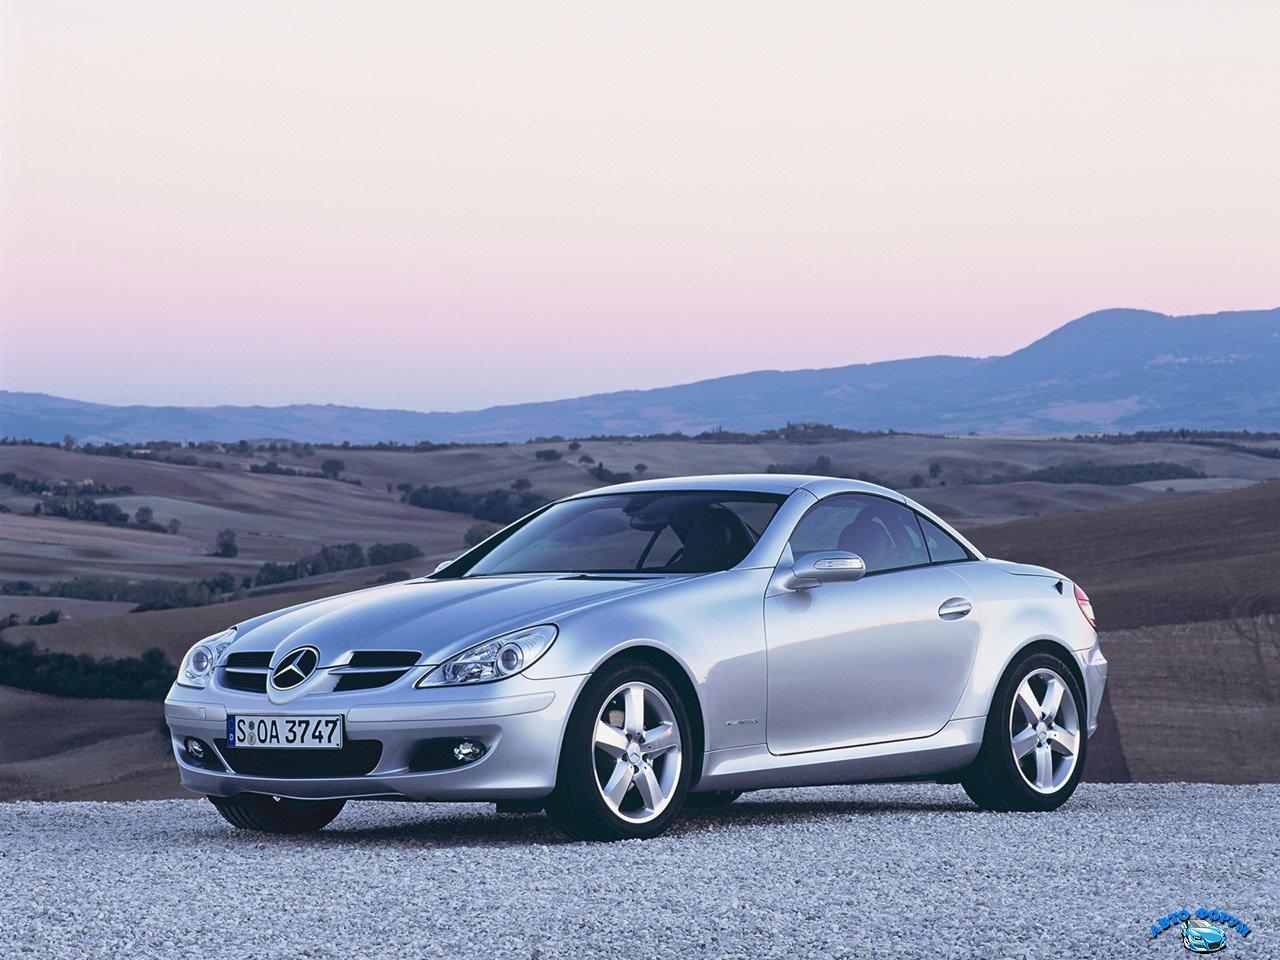 2004-Mercedes-Benz-SLK-fa-1280x960.jpg